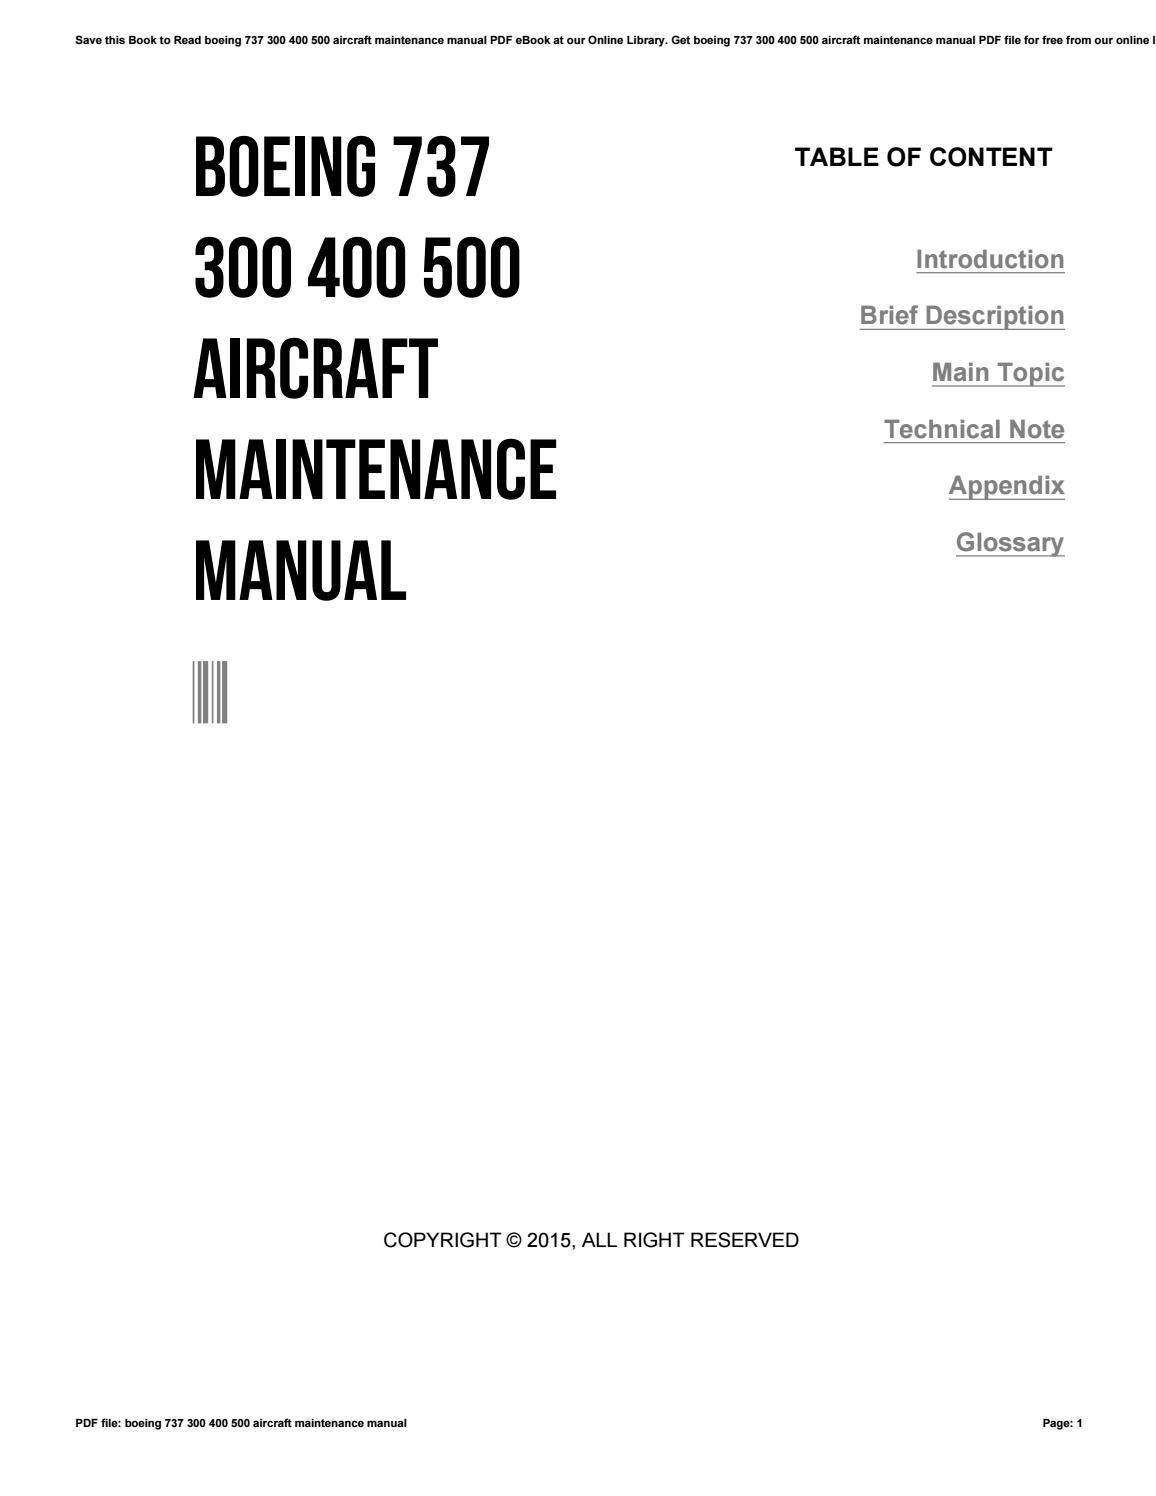 boeing 737 300 400 500 aircraft maintenance manual